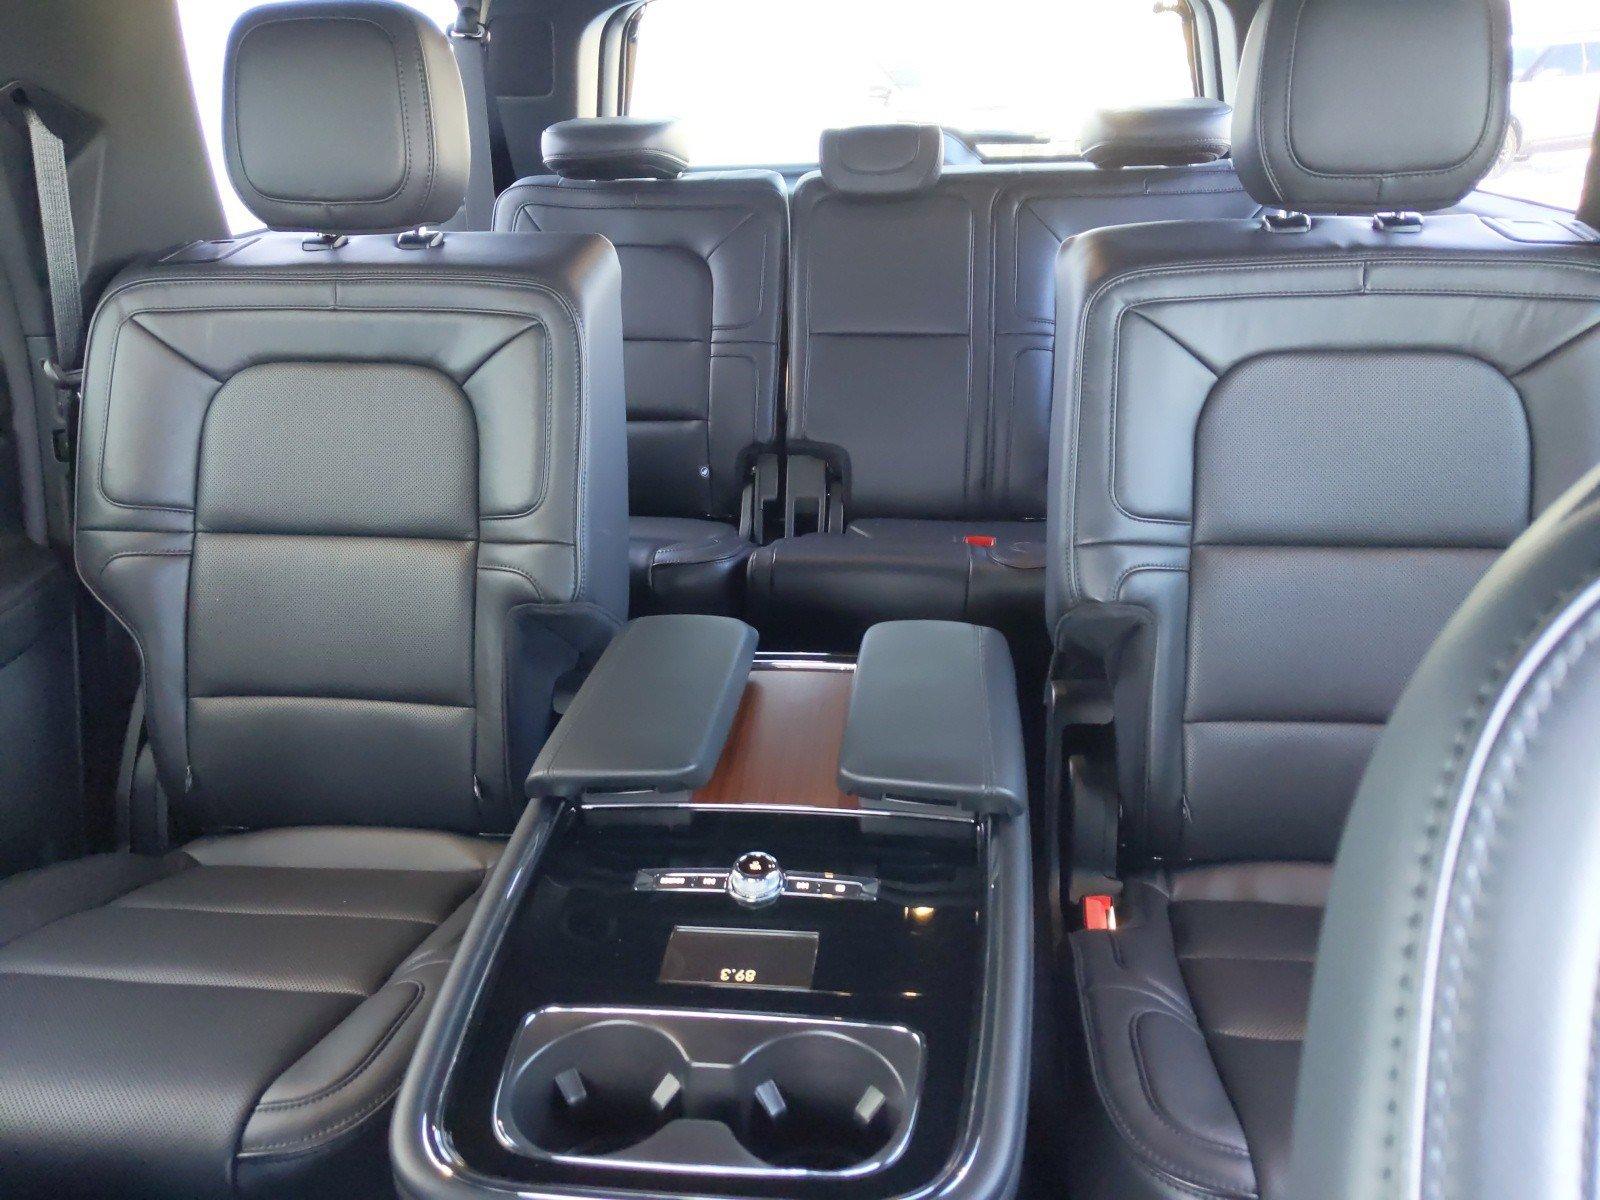 New 2019 Lincoln Navigator L Reserve Sport Utility for sale in Lincoln NE